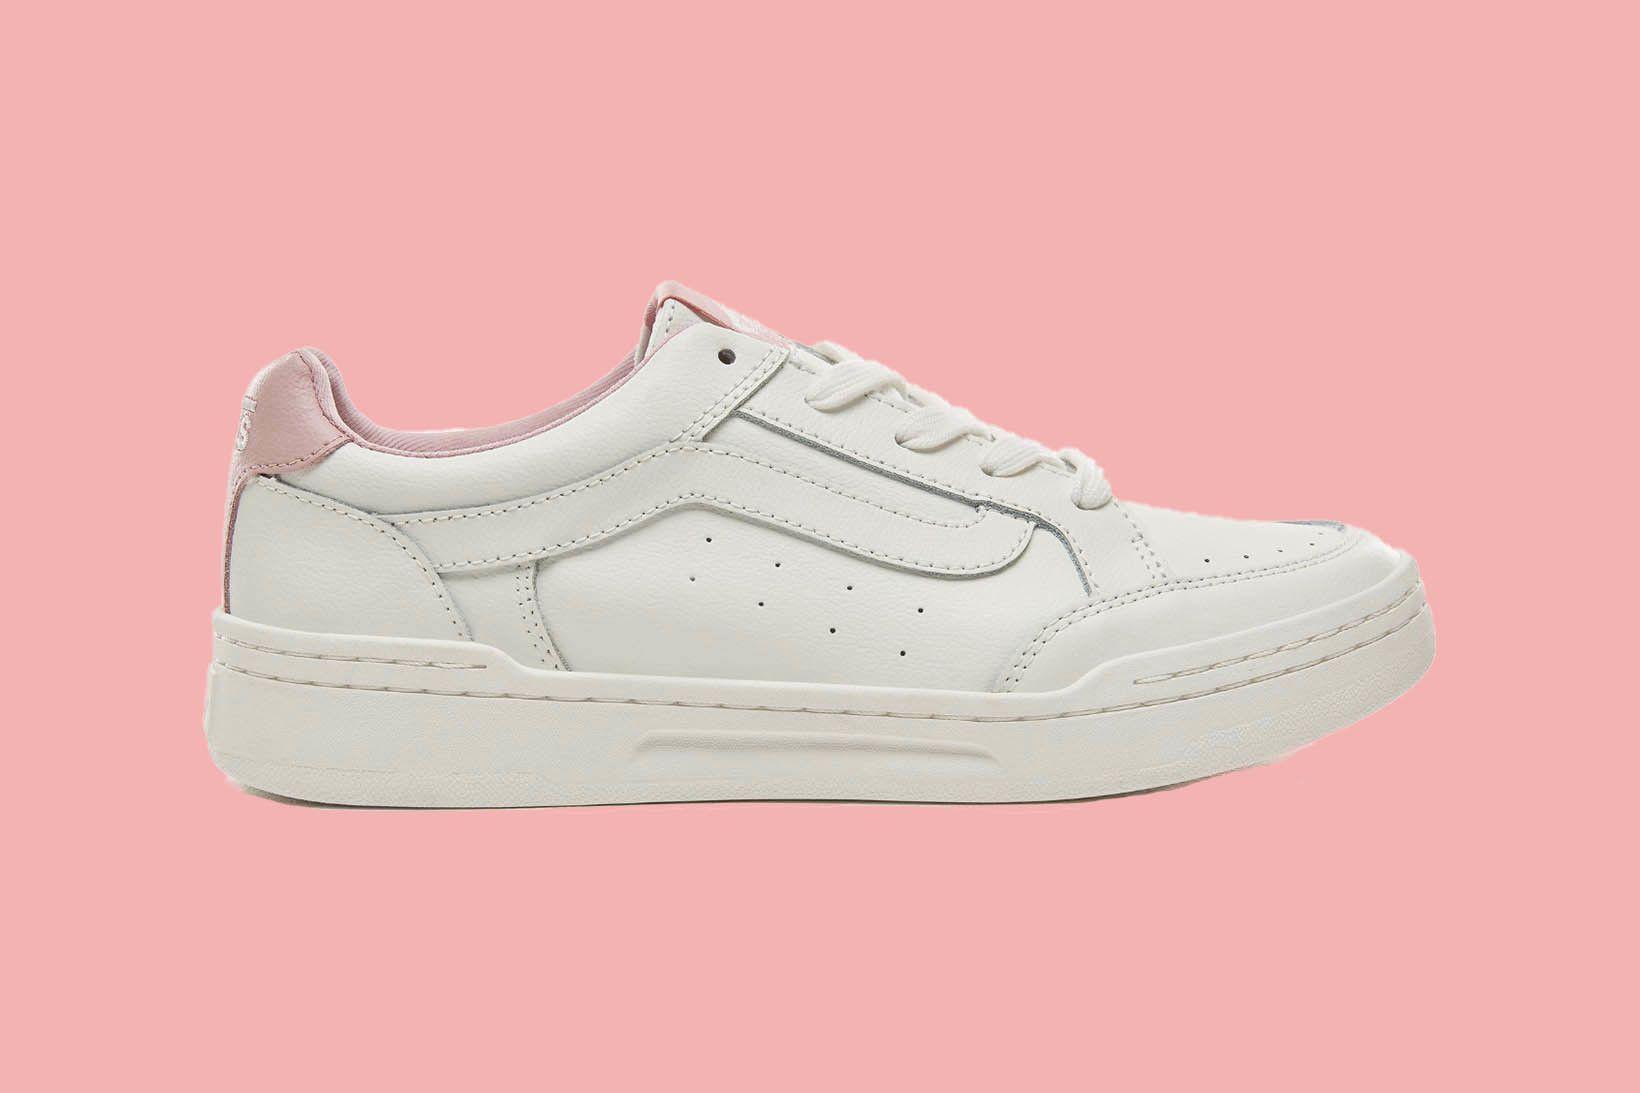 Vans Sporty Highland Pink Zephyr White Sneakers 1 1 Sneaker Freaker